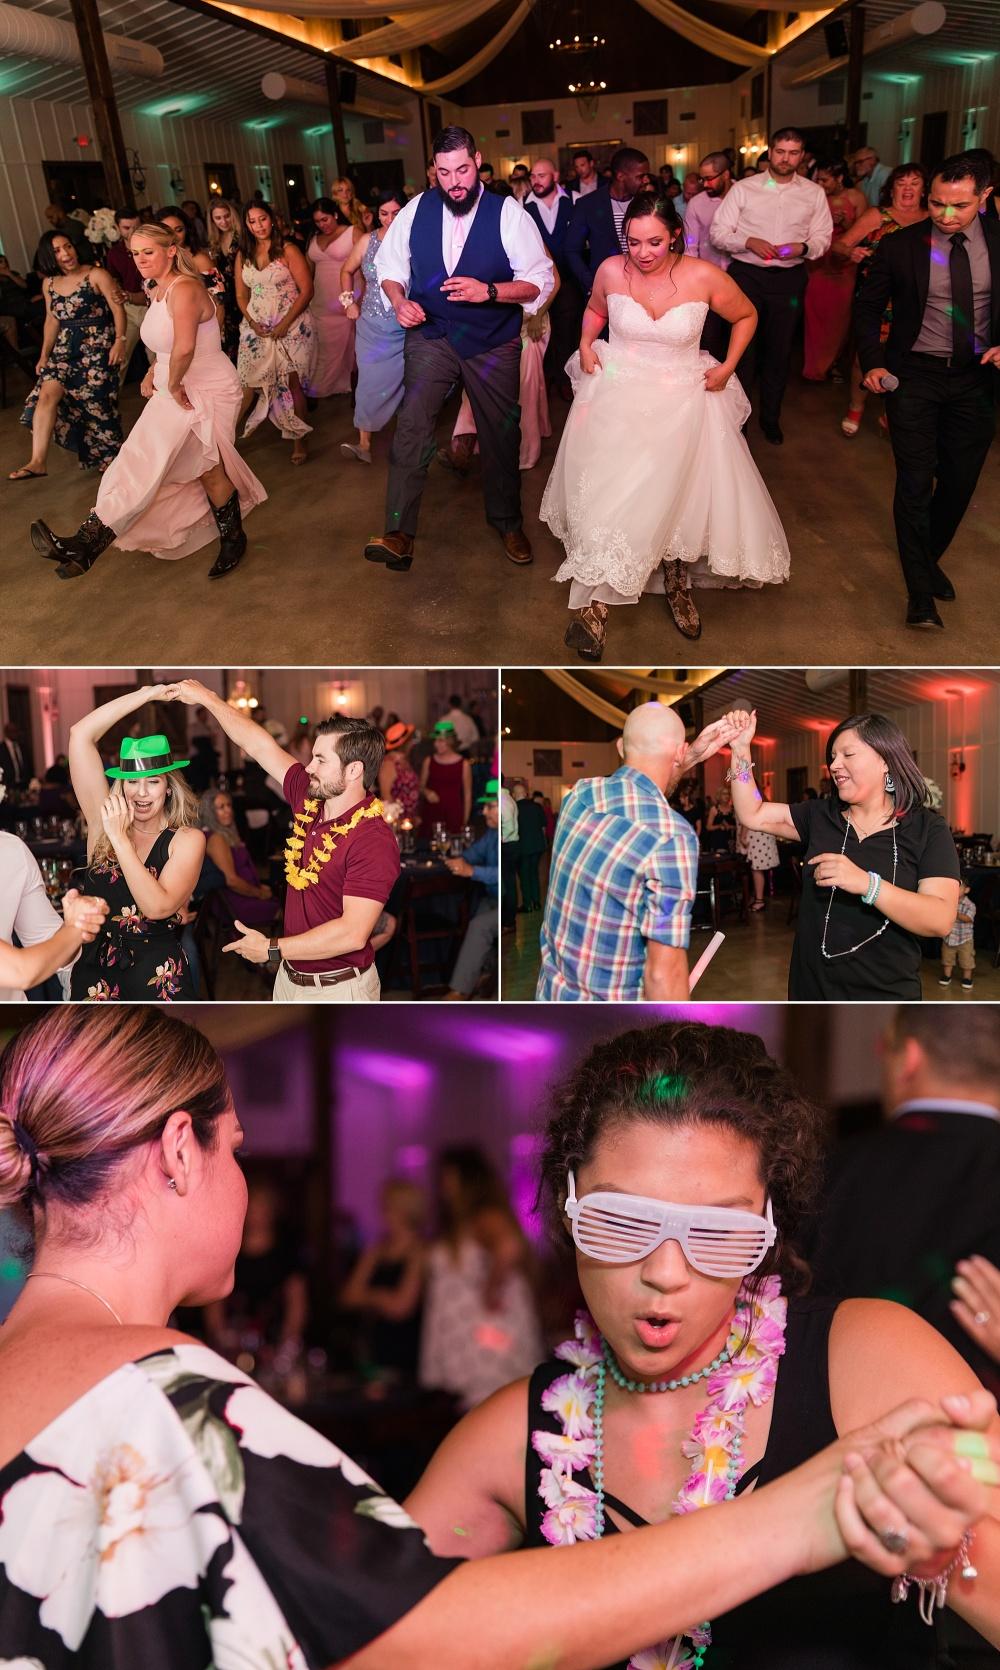 Wedding-Photographer-Bulverde-Texas-Western-Sky-Event-Venue-Carly-Barton-Photography_0086.jpg